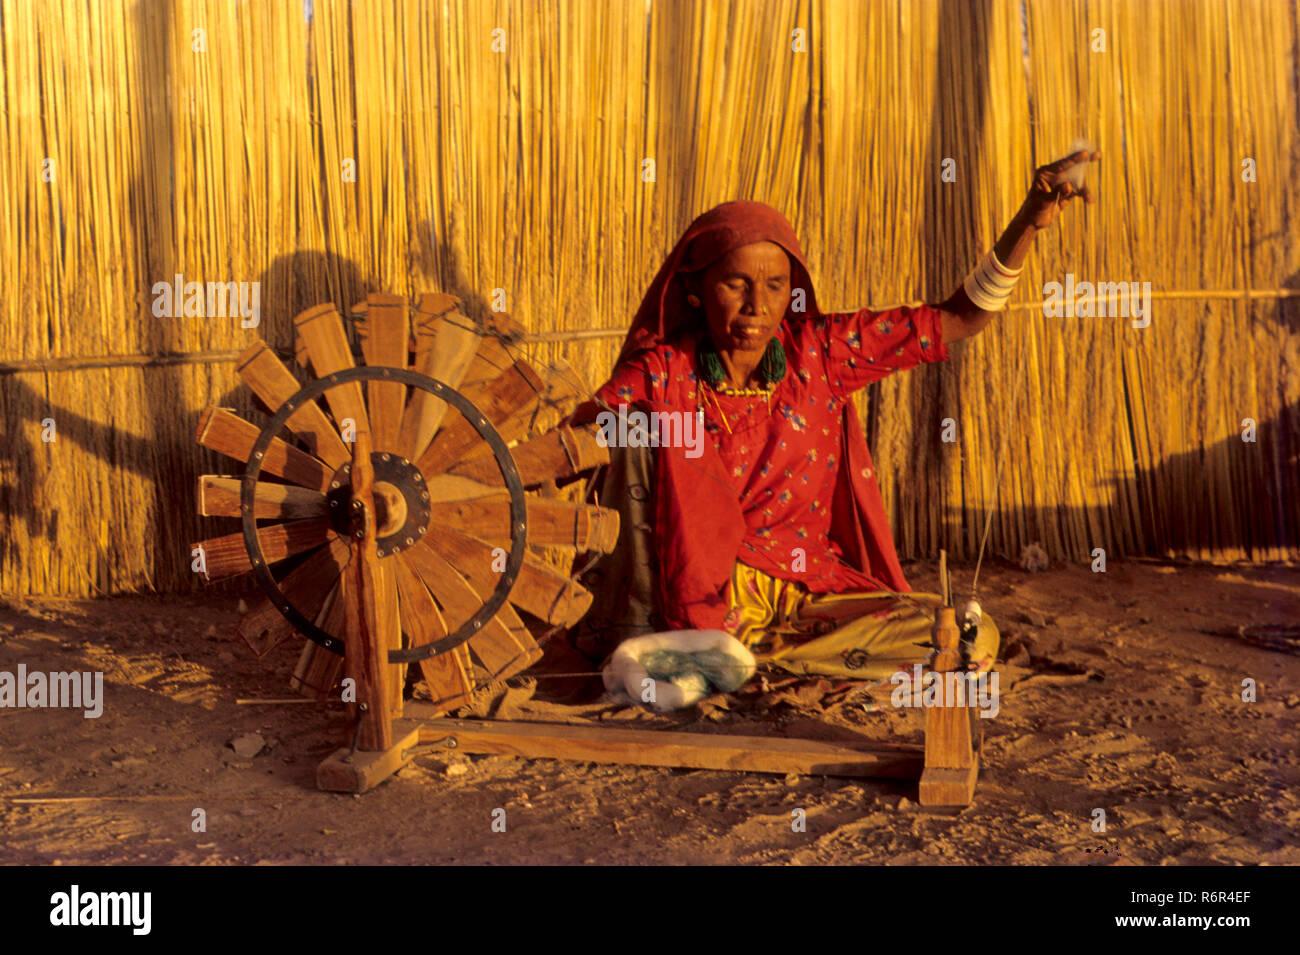 woman working spinning wheel charkha, handloom weaving